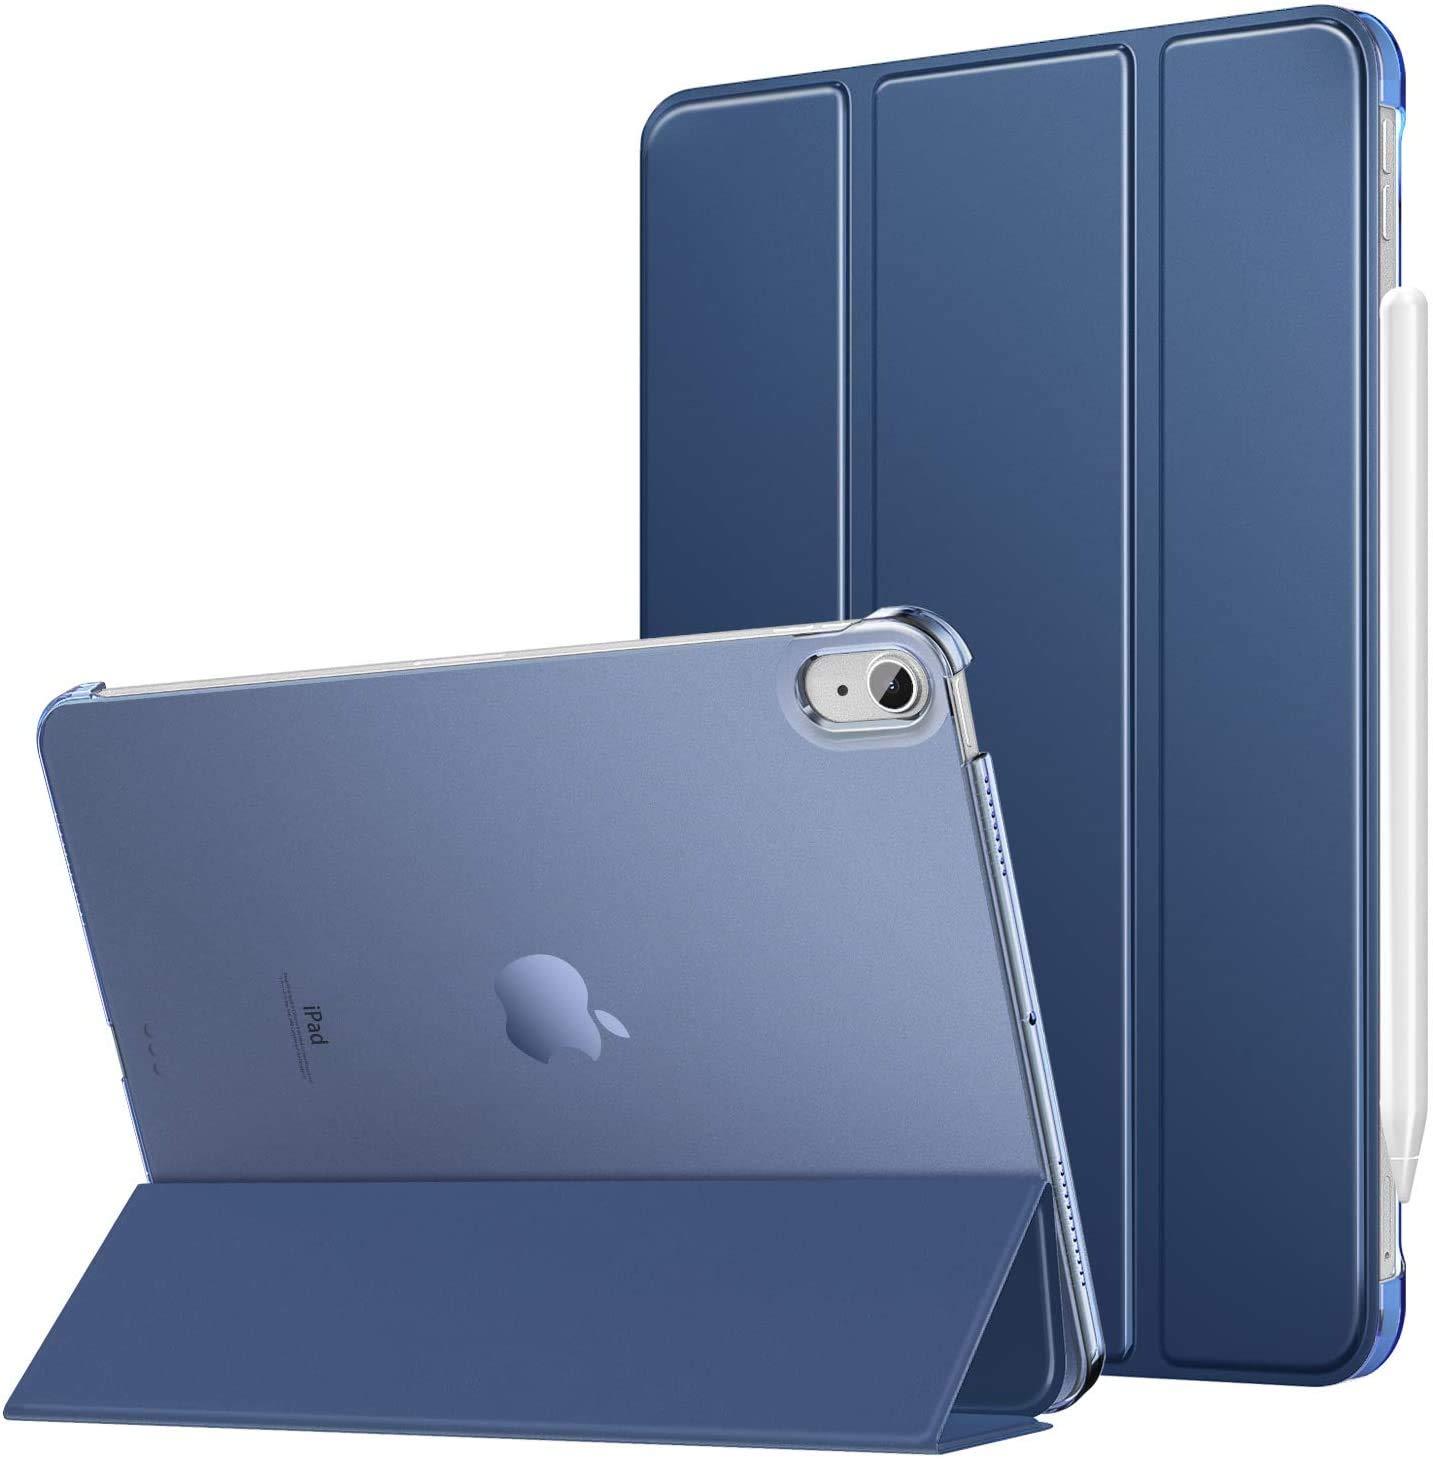 ProElite Smart Flip Case Cover for Apple iPad Air 4 10.9 inch , Translucent Back, Dark Blue